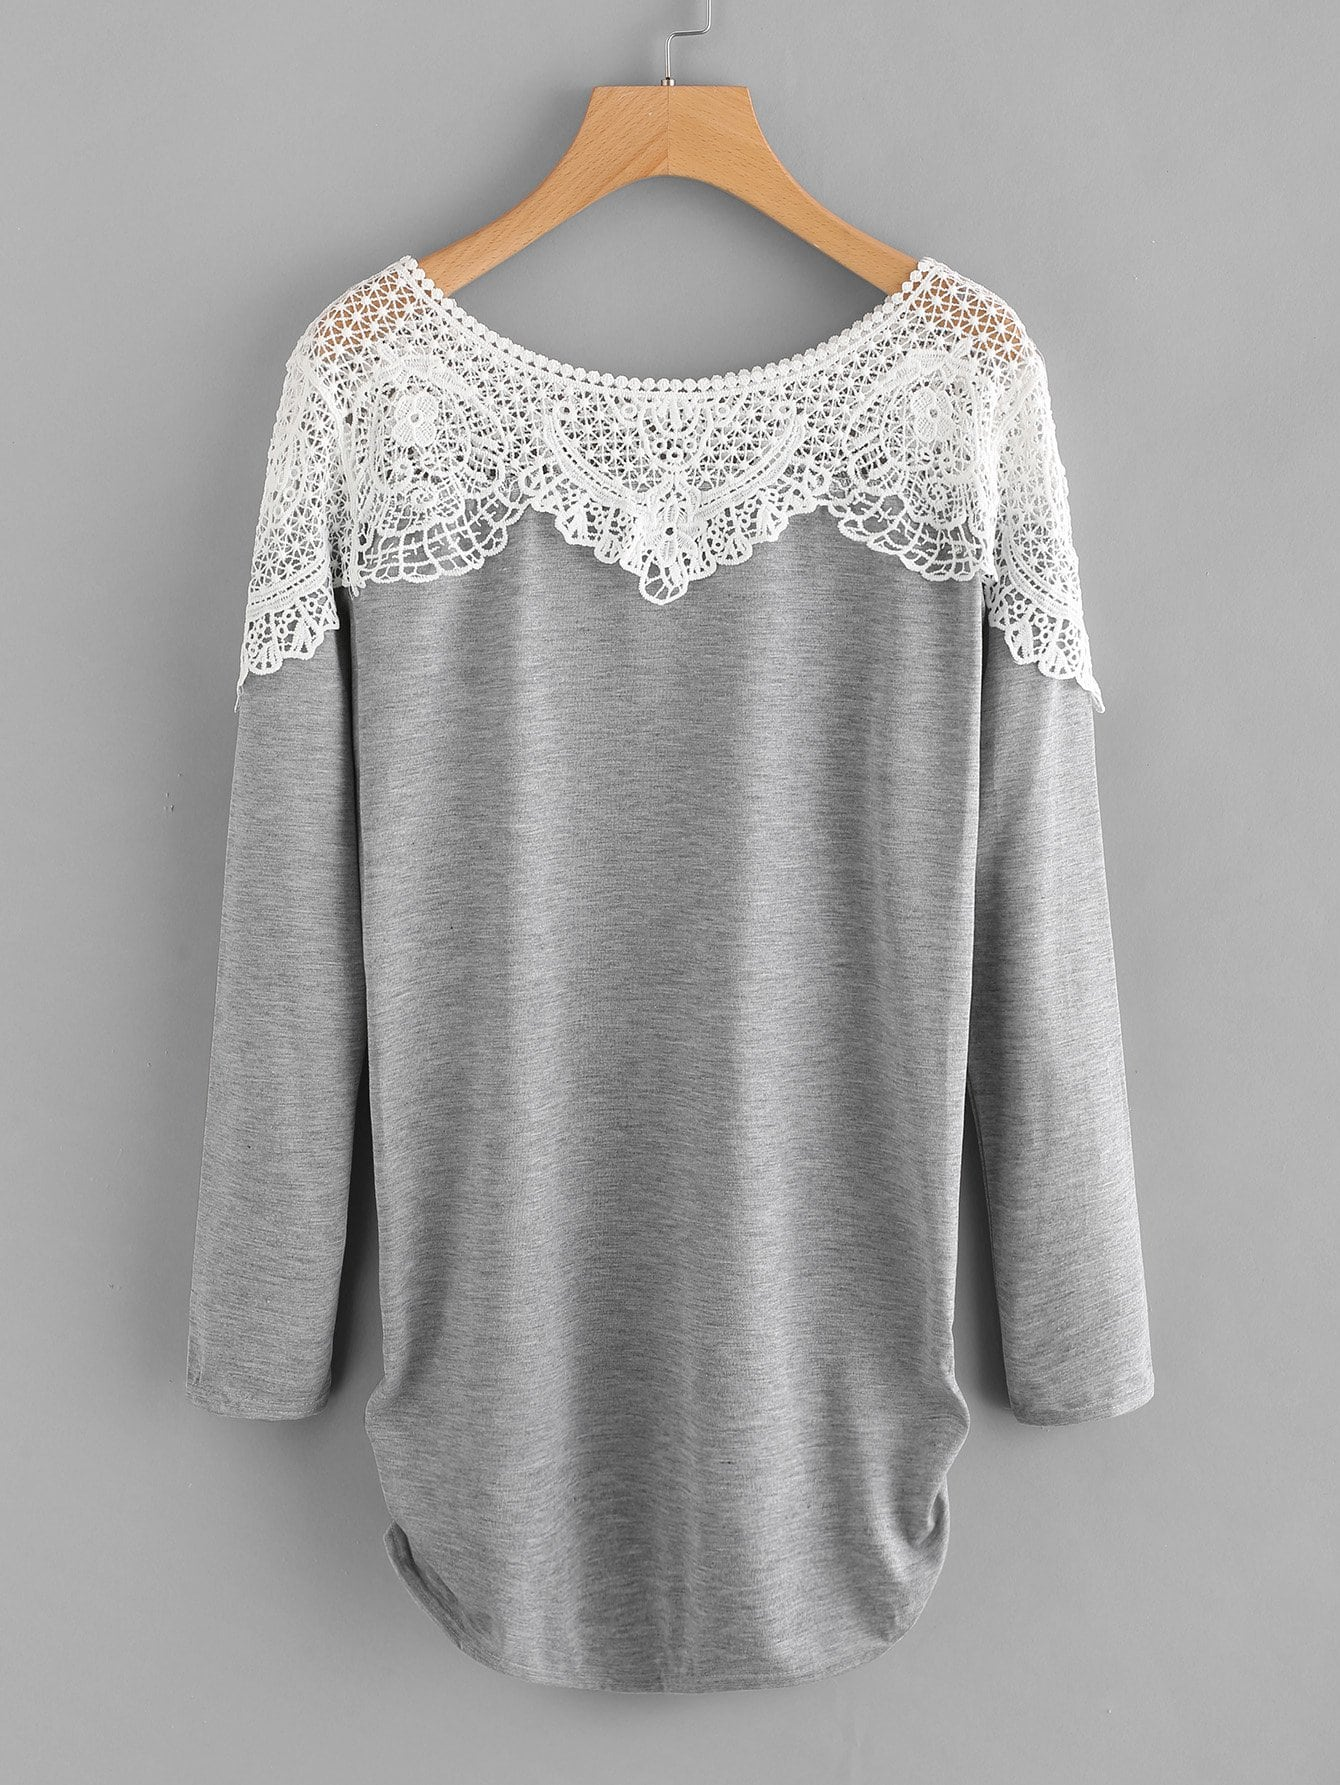 Купить Плюс размеры контрастные кружева футболка, null, SheIn